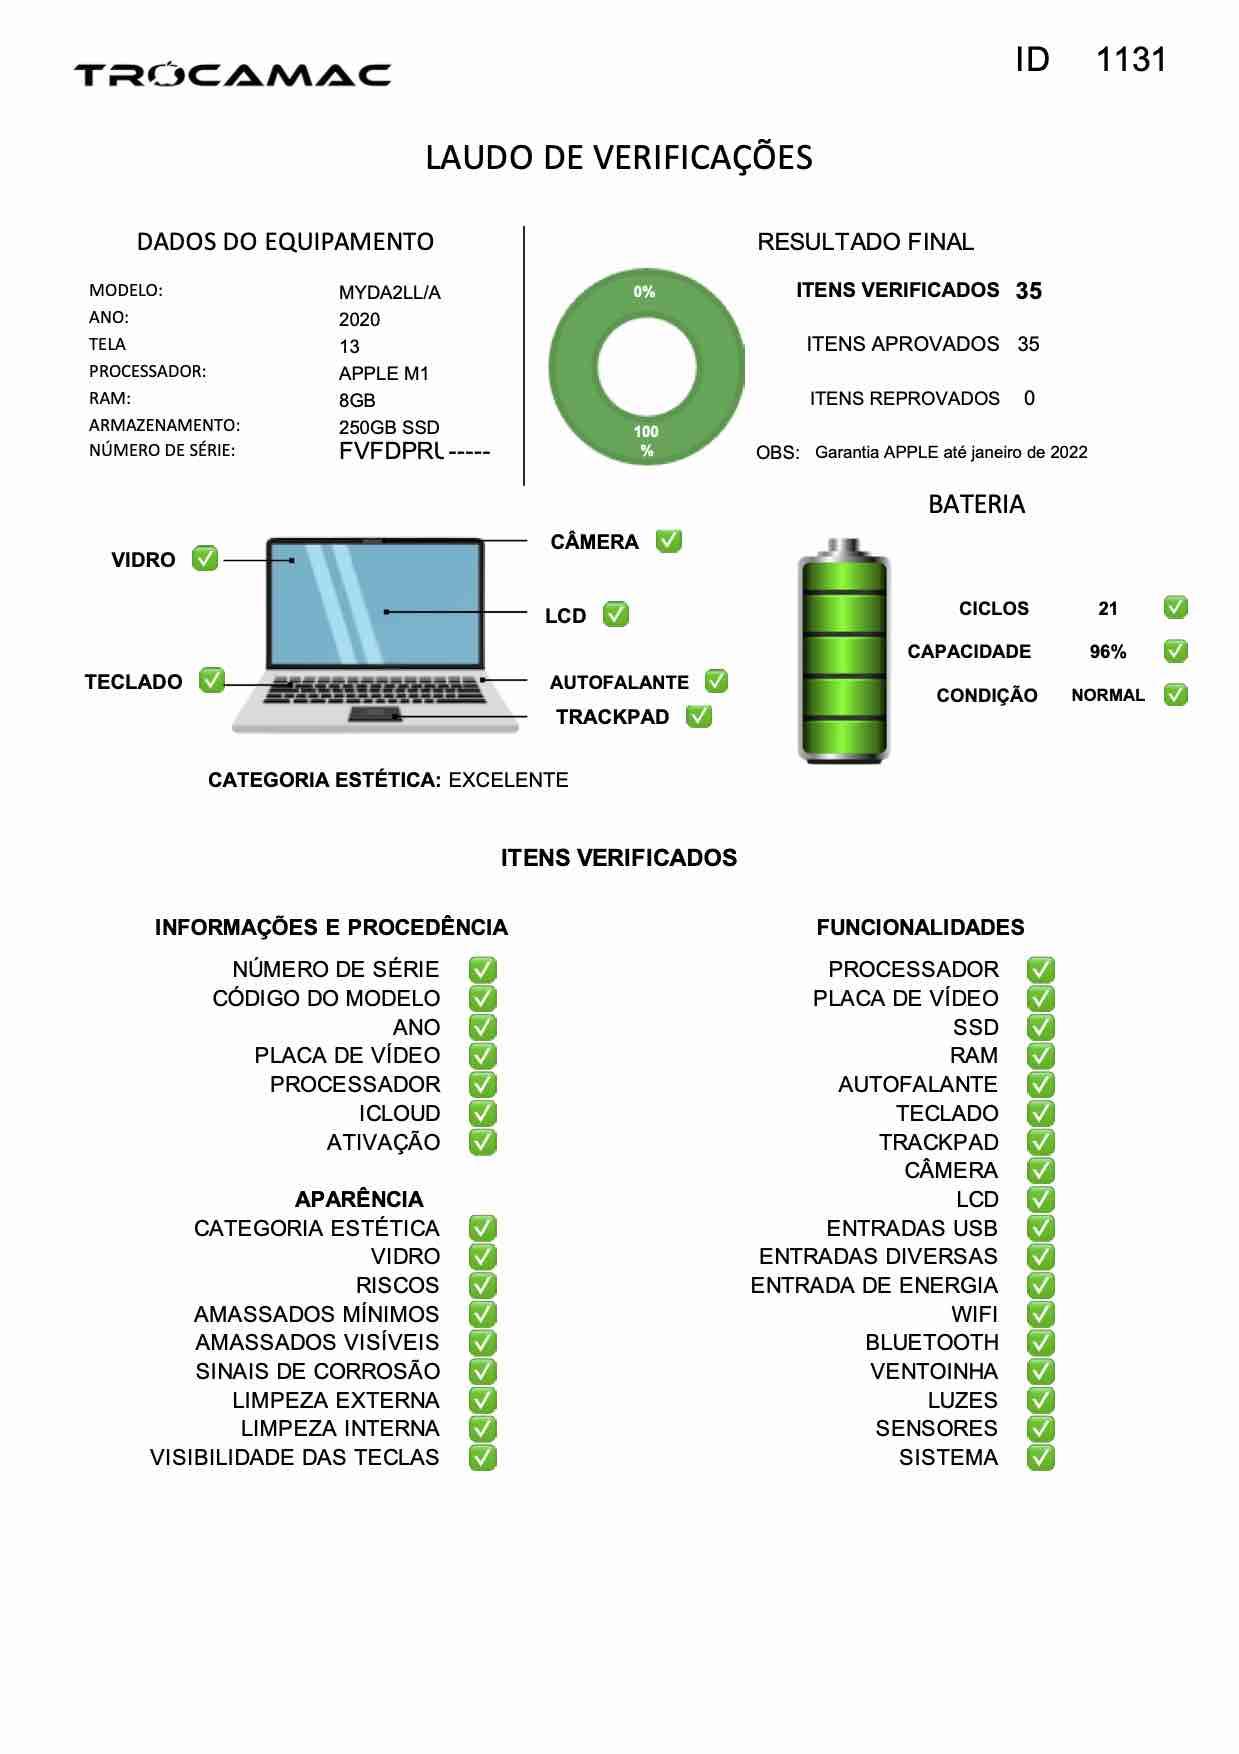 Macbook Pro 13 Space Gray Apple M1 8GB 256gb SSD MYDA2LL/A Seminovo